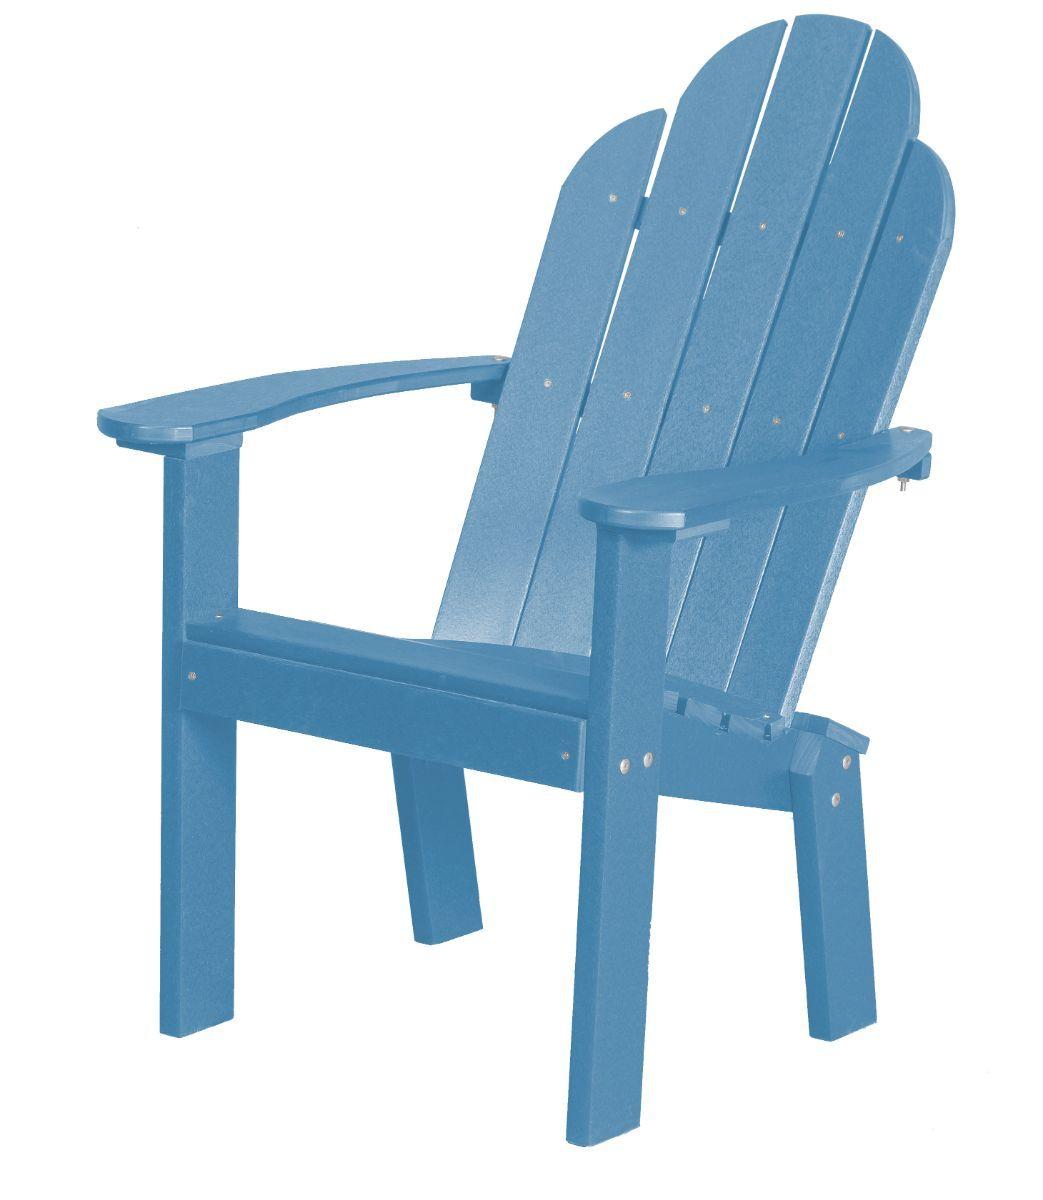 Powder Blue Odessa Outdoor Dining Chair